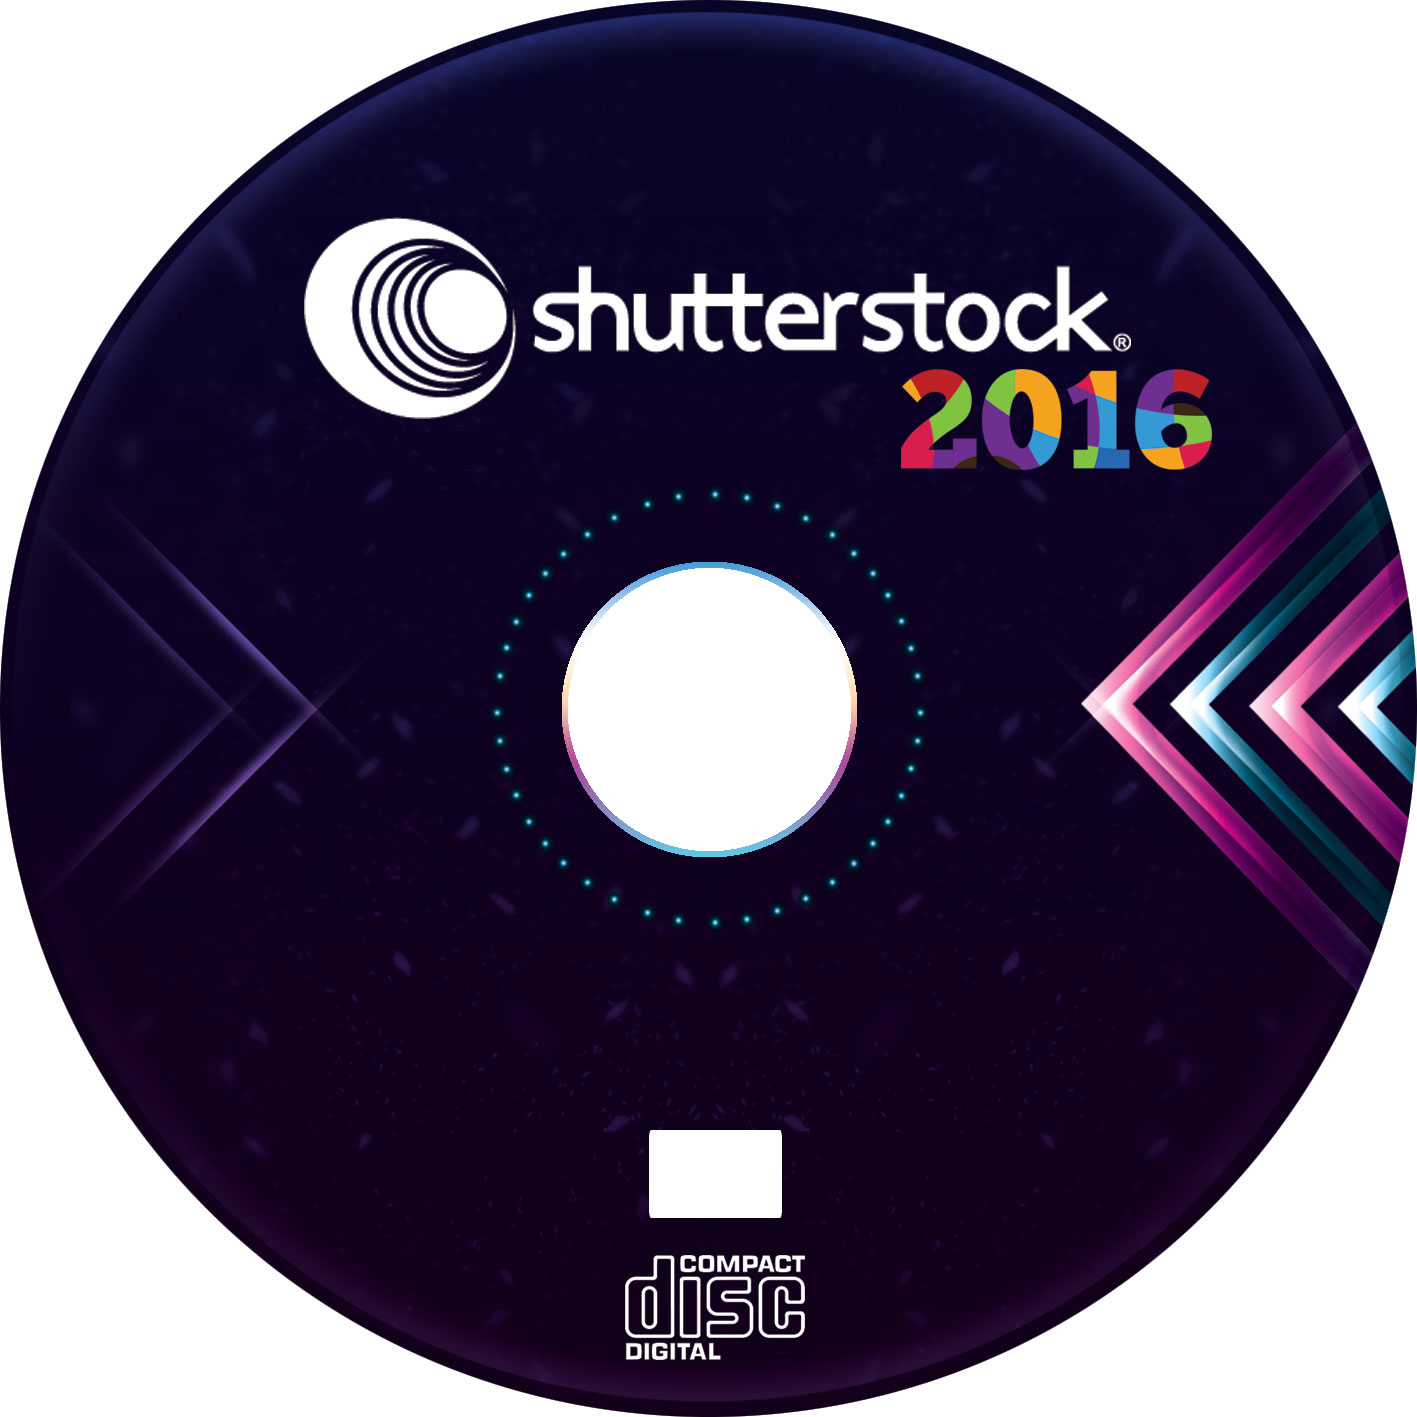 cover2 دانلود مجموعه عکس شاتر استوک ShutterStock 2016